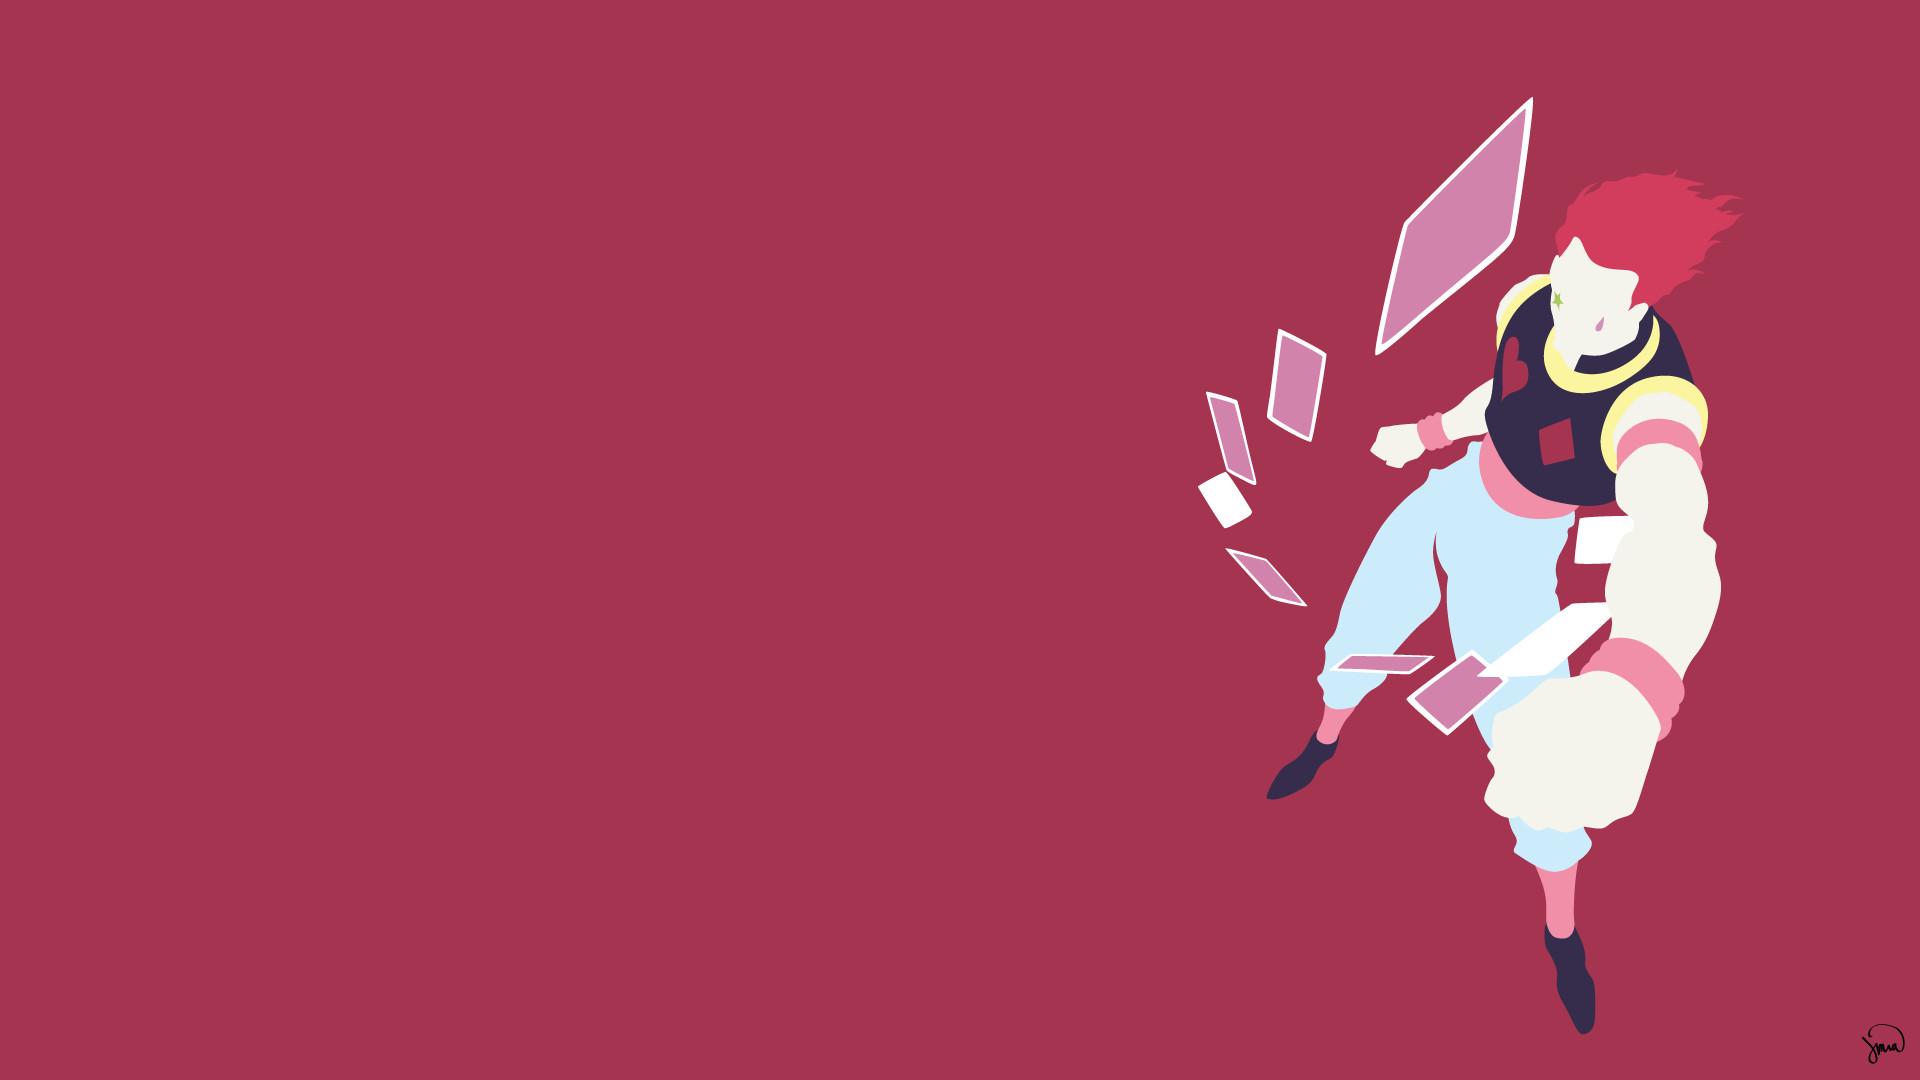 Hisoka (Hunter x Hunter) Minimalista Wallpaper por